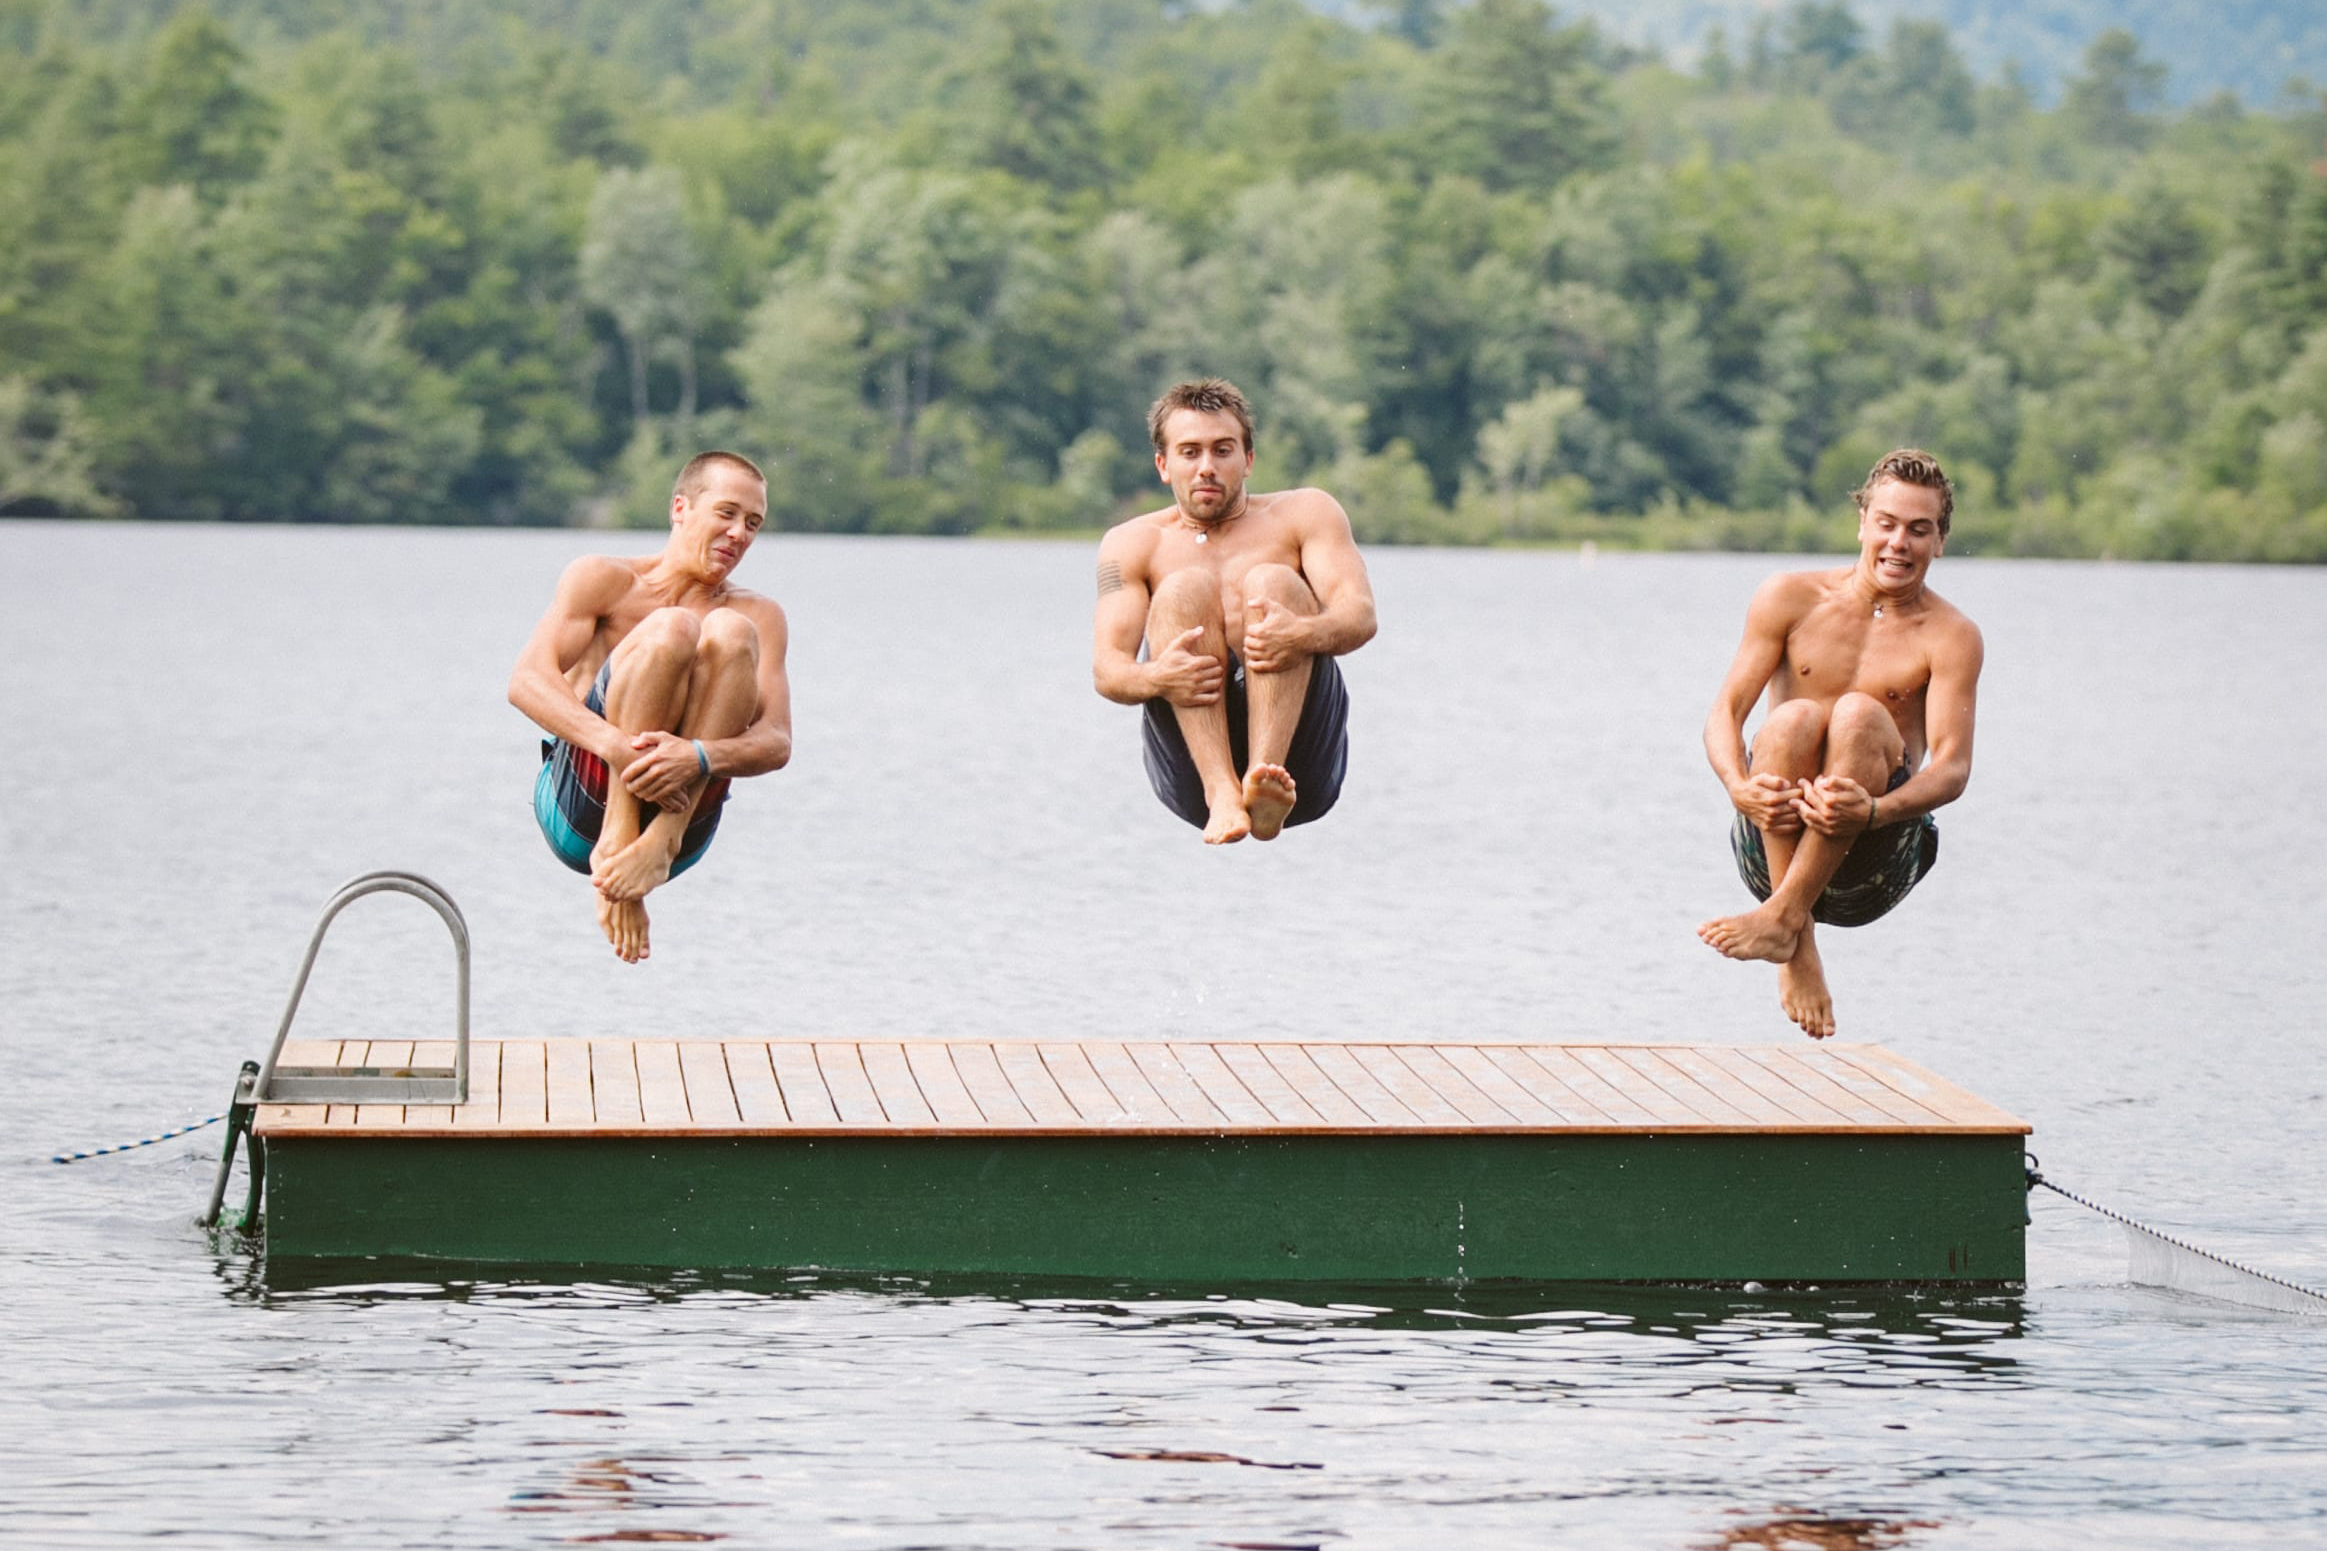 Three men jumping of dock into lake